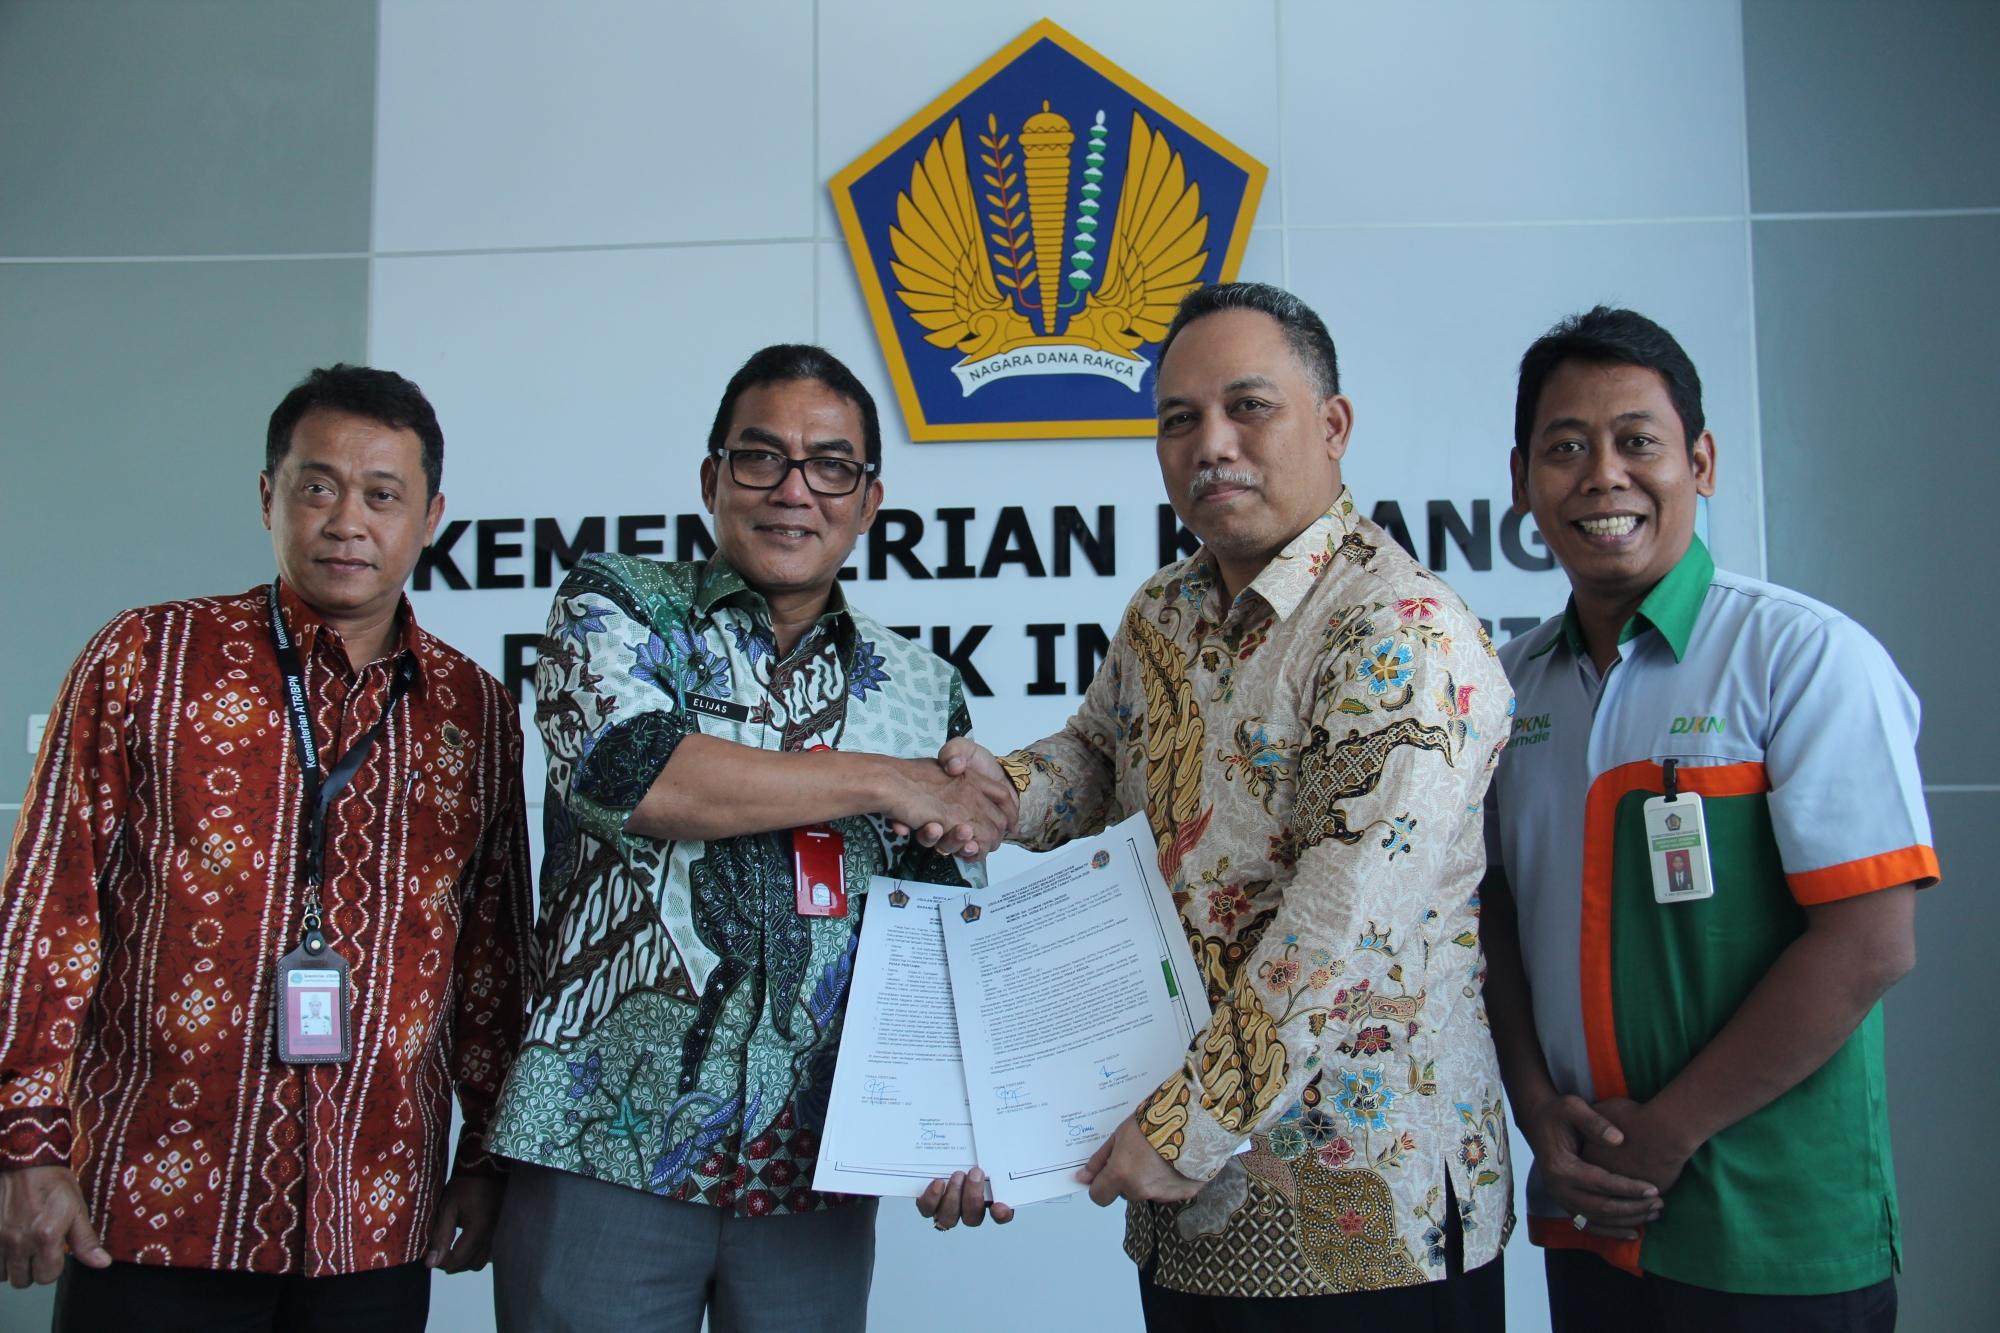 Percepat Penyelesaian Sertipikasi BMN,  KPKNL Ternate Kolaborasi dengan BPN Maluku Utara